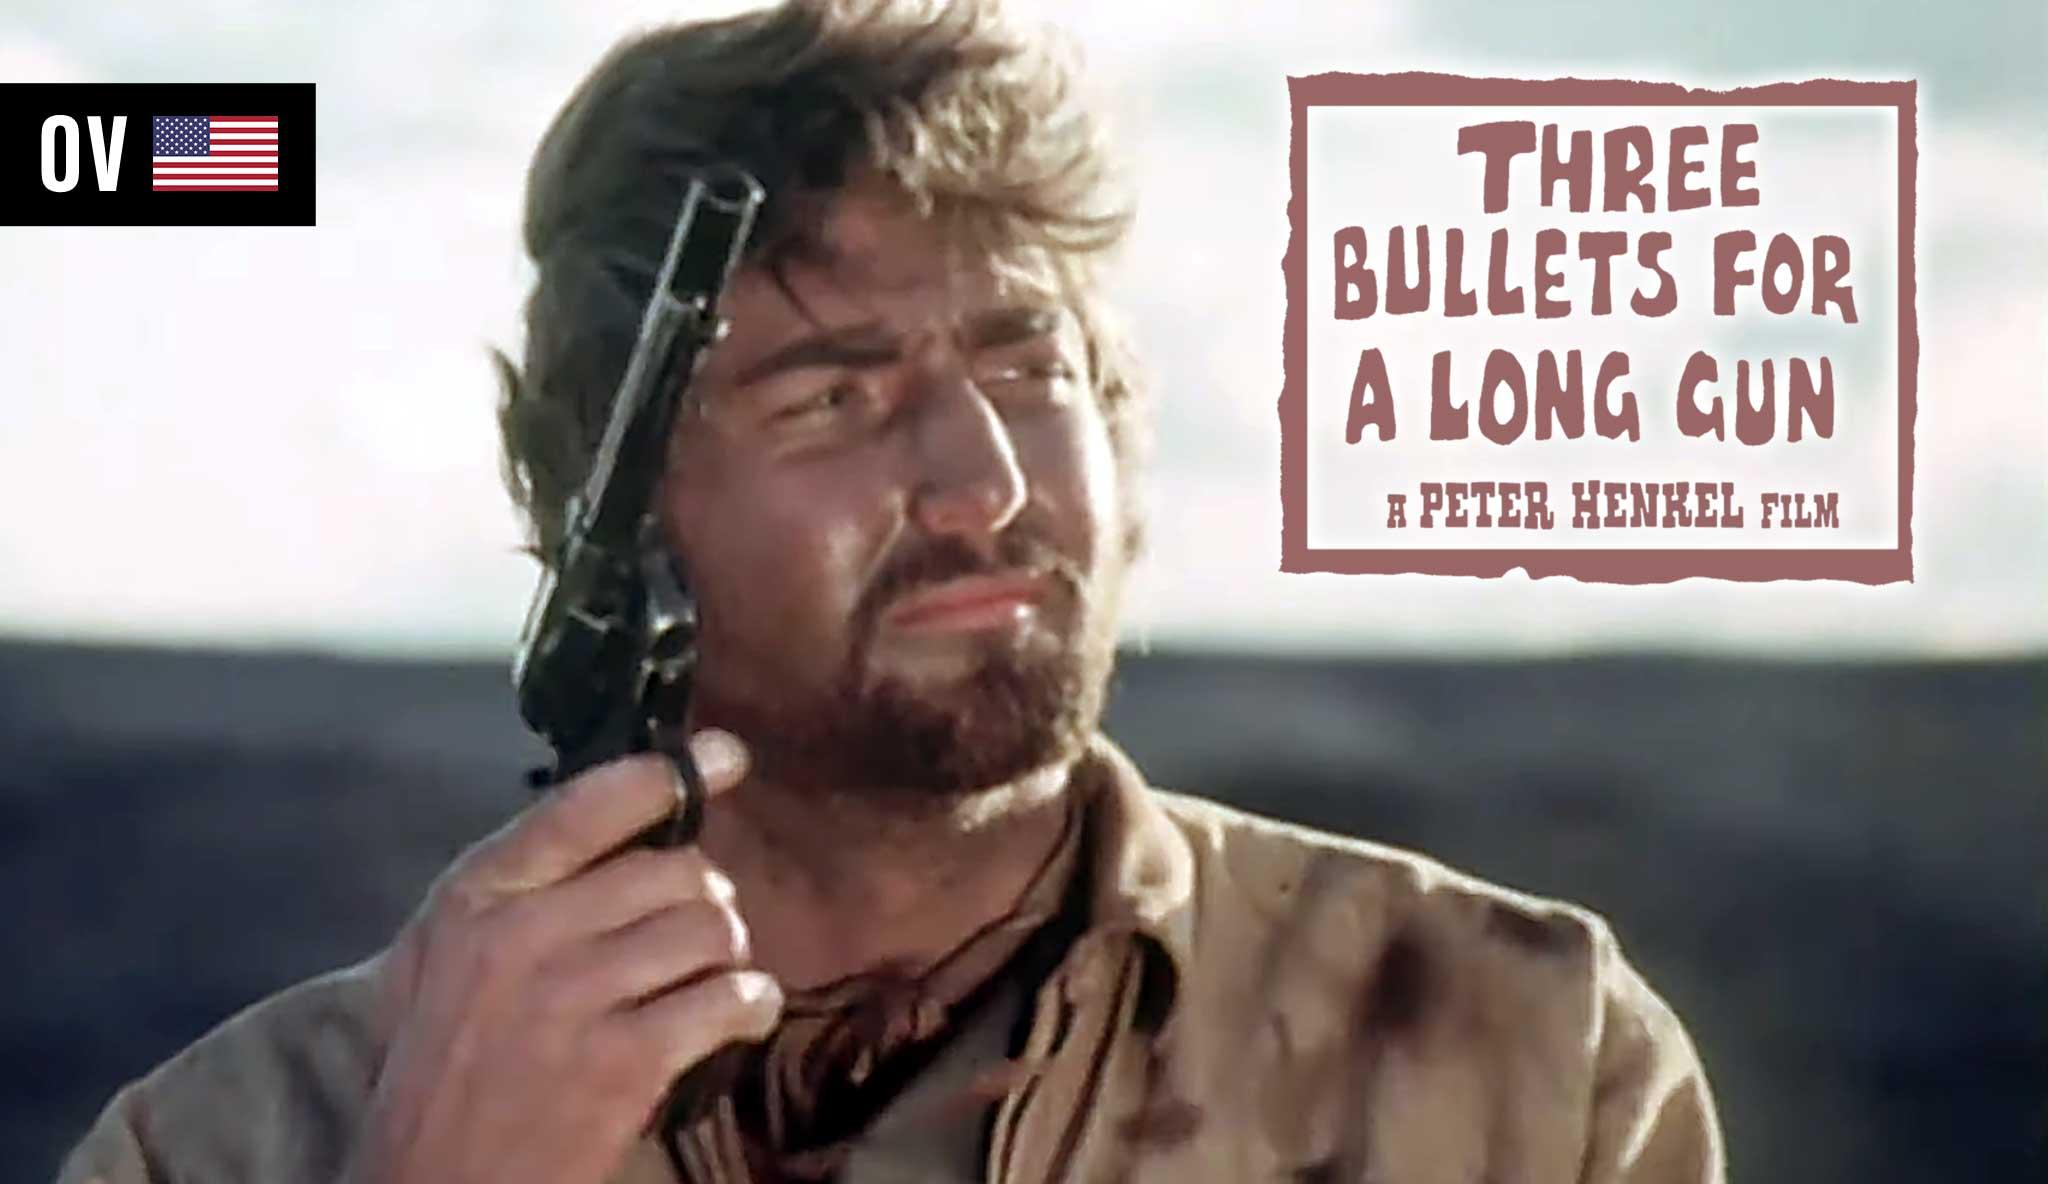 three-bullets-for-a-long-gun\header.jpg